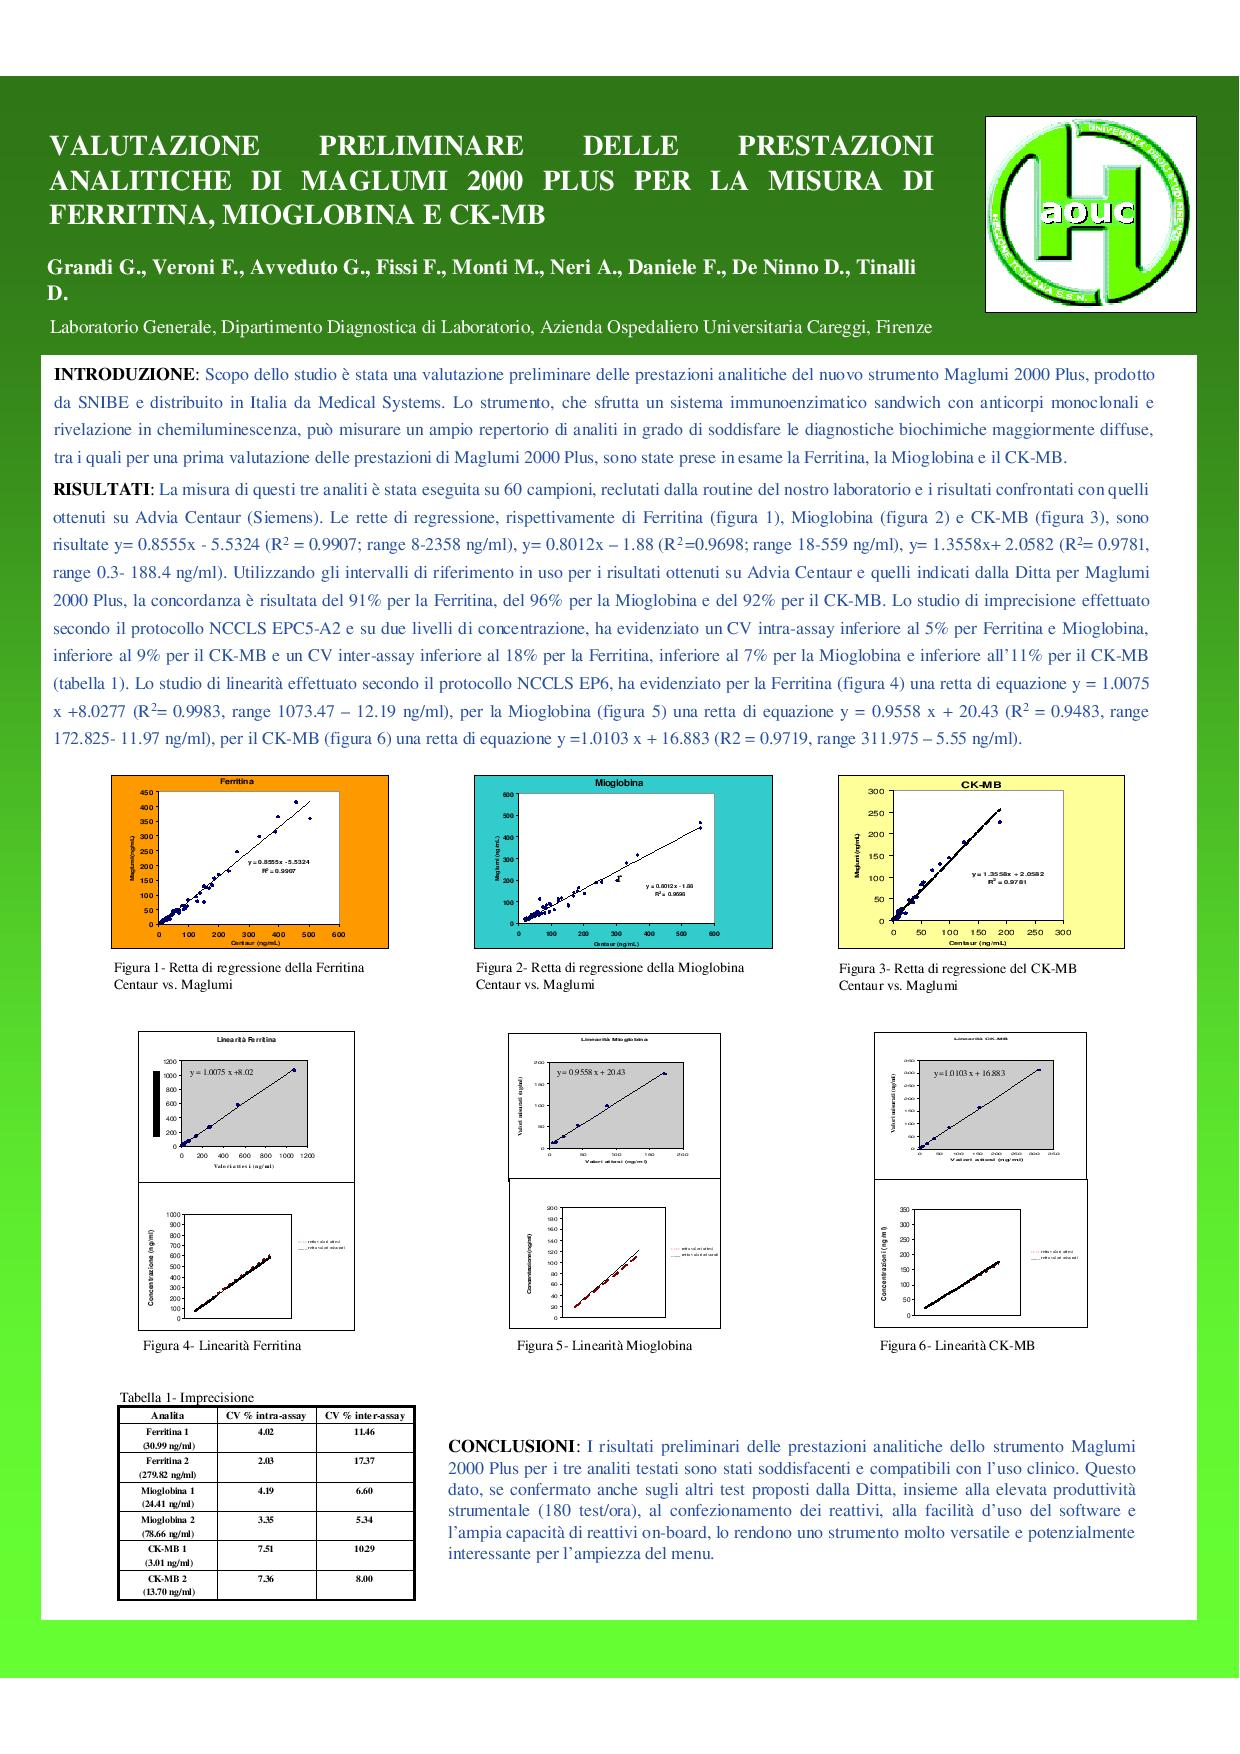 MAGLUMI Ferritina, Miogl.,CK-MB, Poster SIBioC 2012, Careggi-page-001